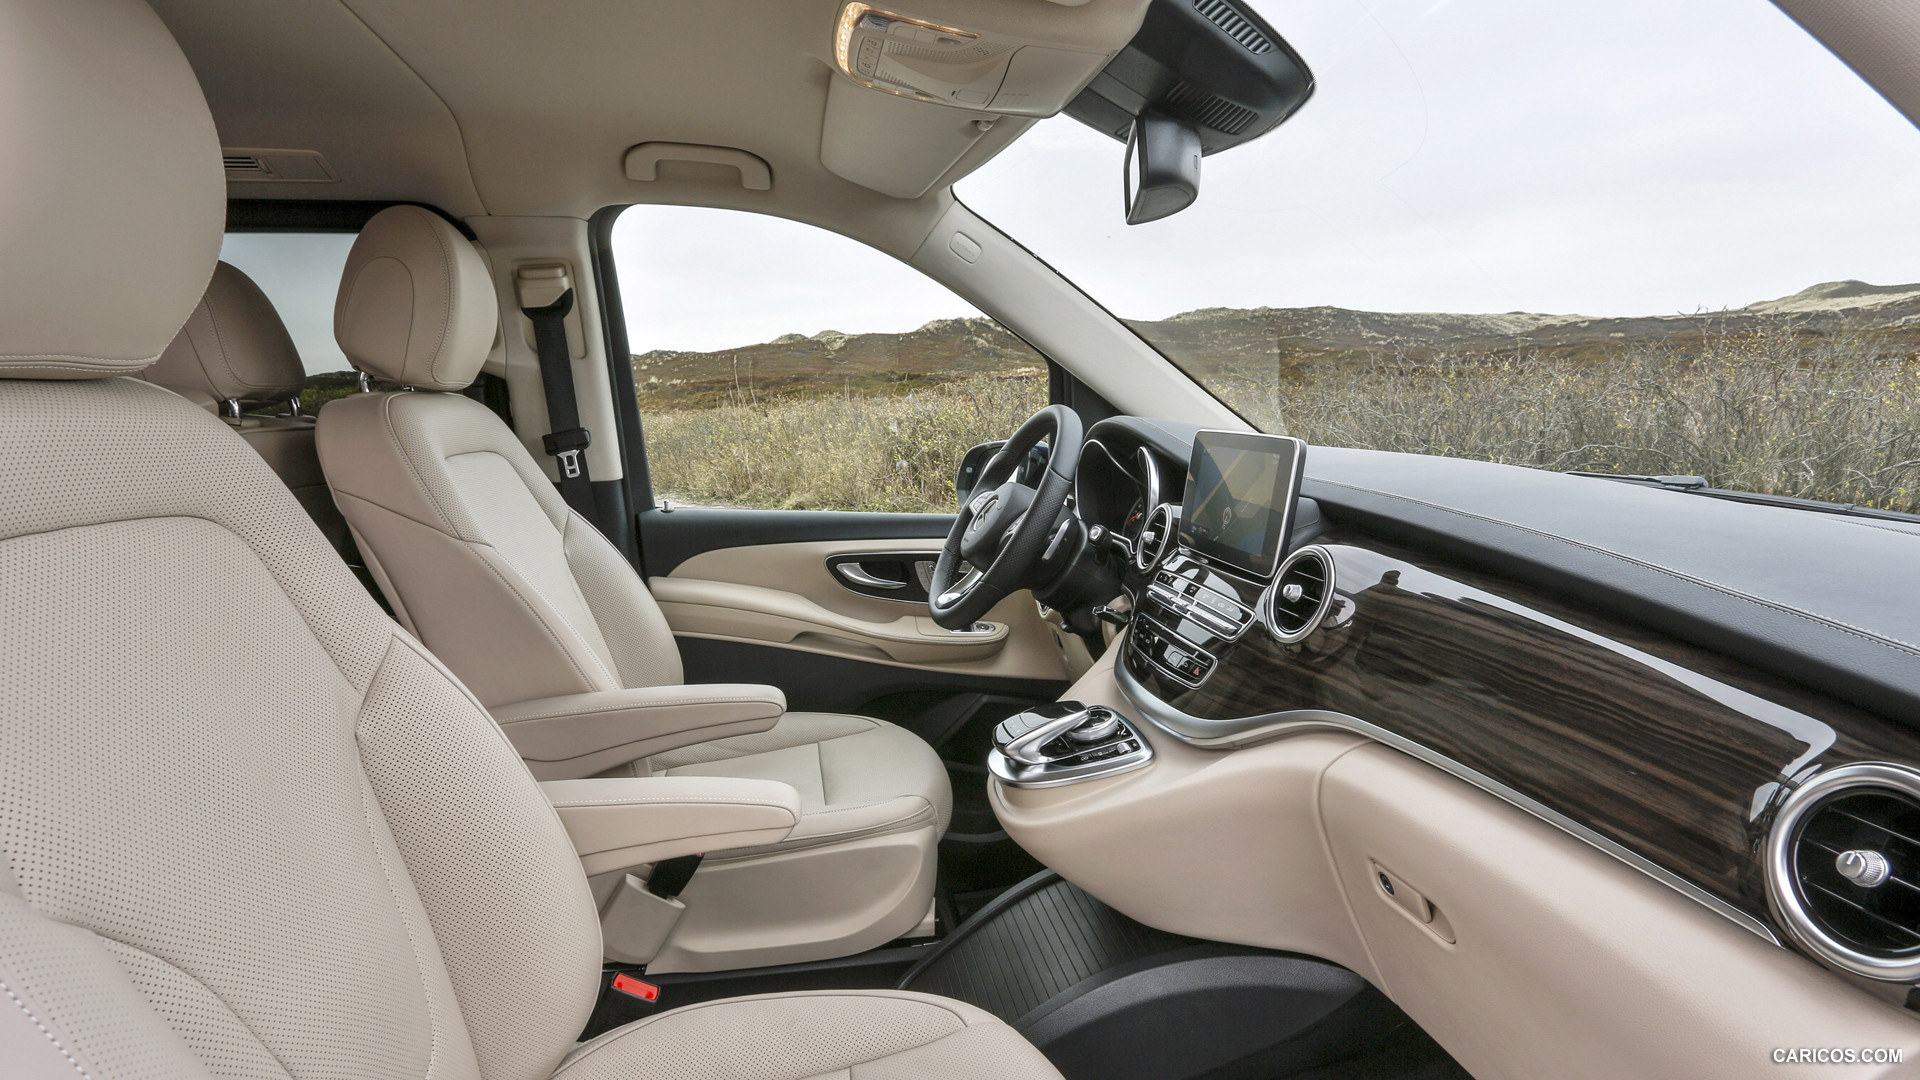 Mercedes-Benz V-Class photo 118358